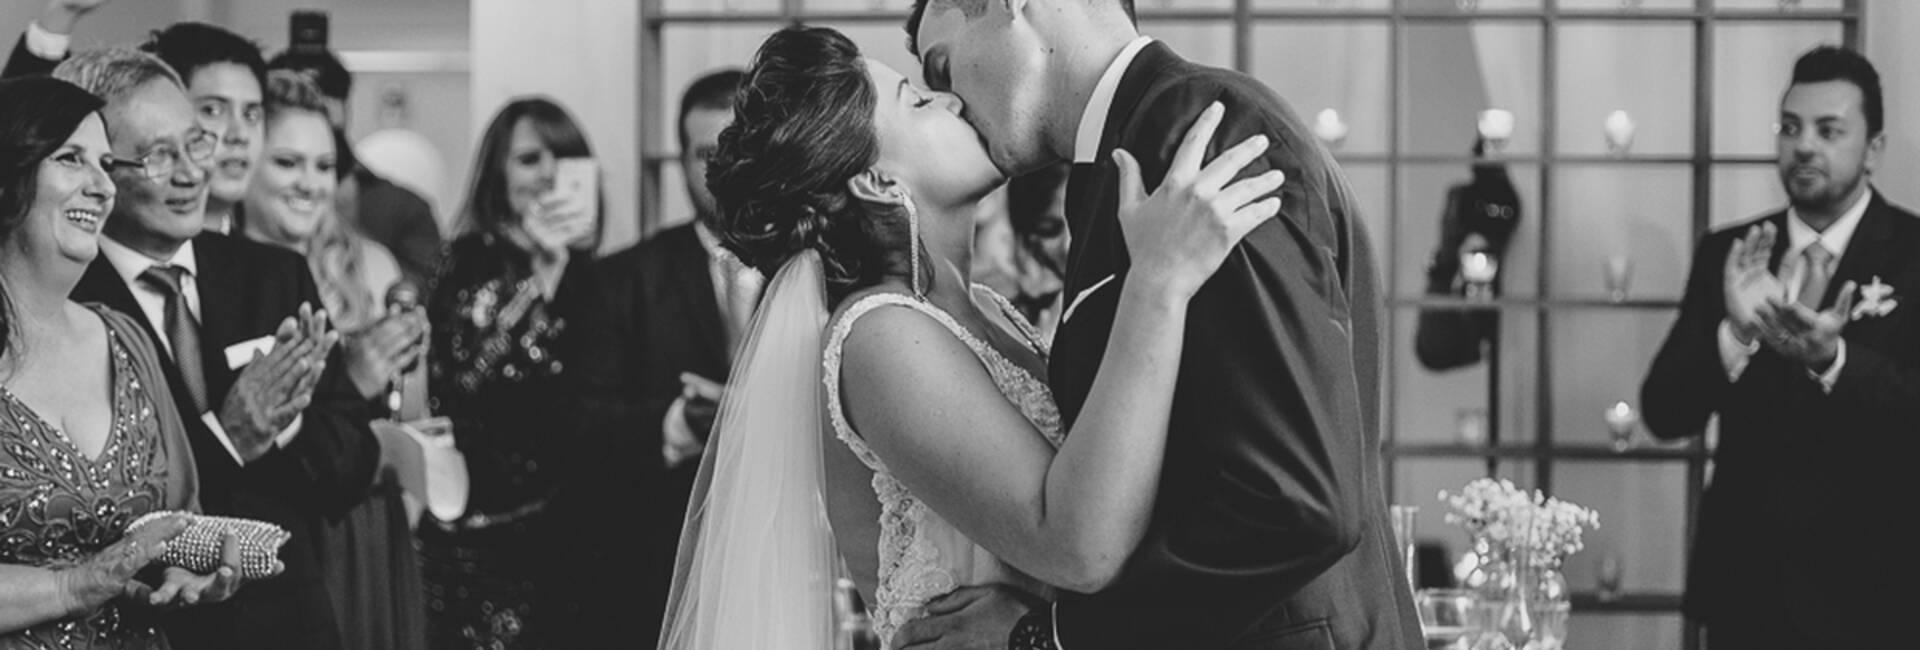 Casamento de Camila + Patrick